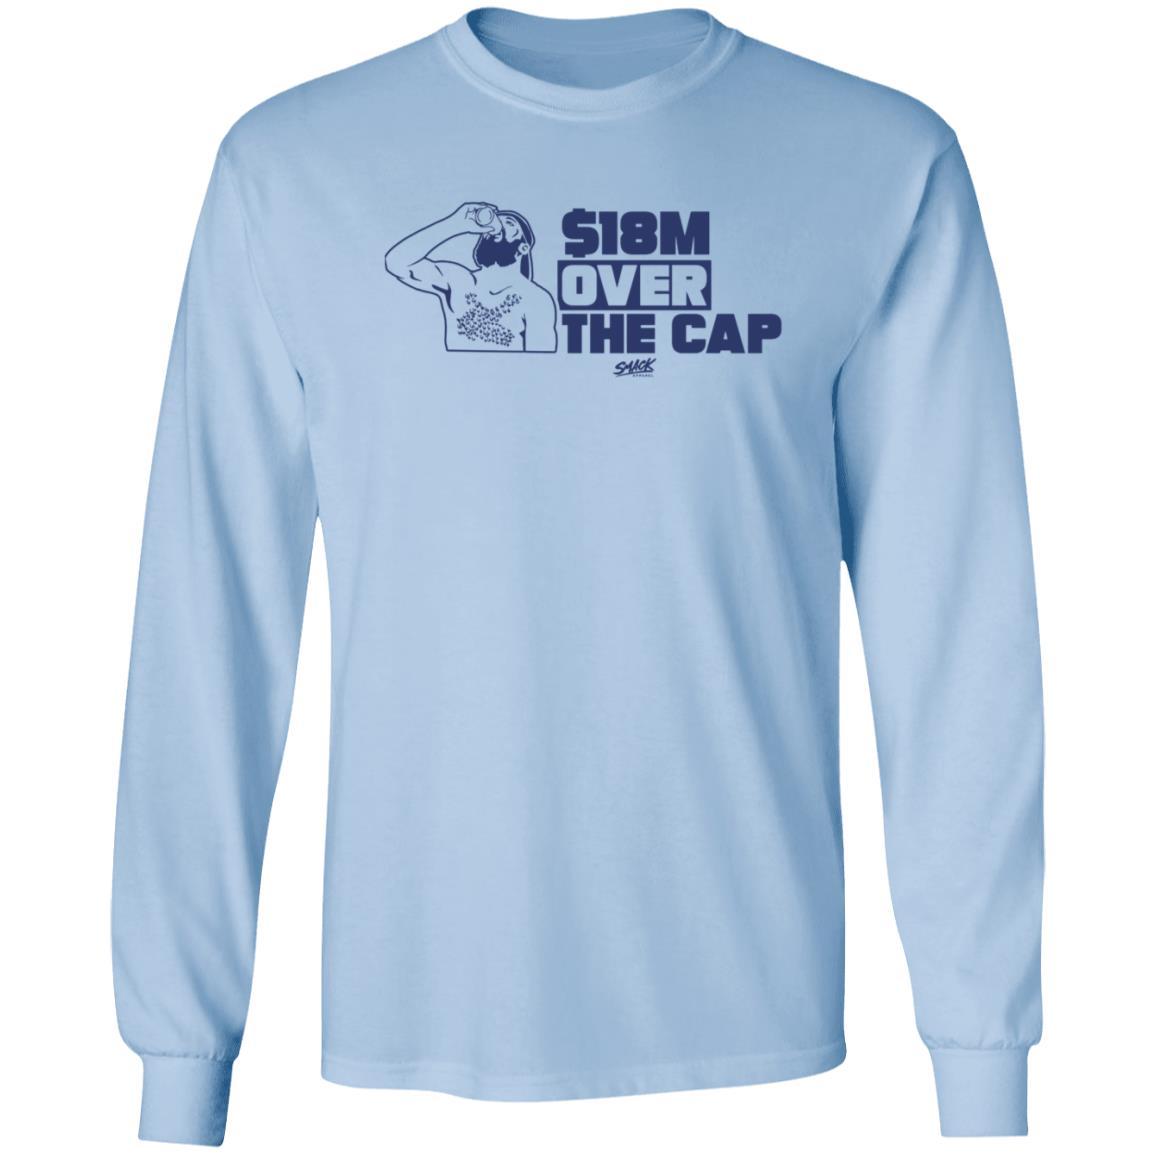 $18M ($18 Million) Over The Cap Hockey Shirt For Tampa Bay Fans Kucherov